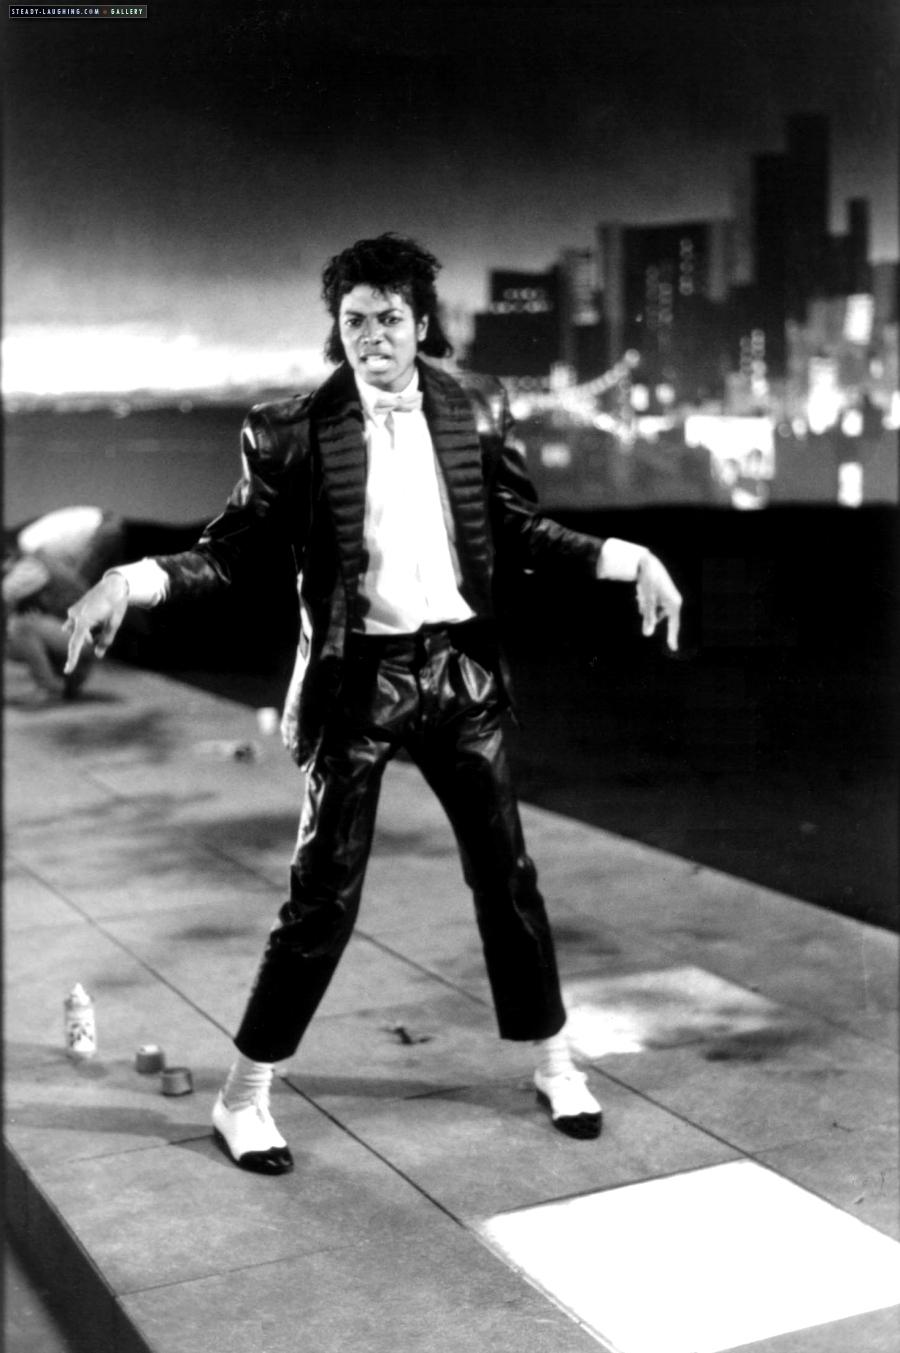 Michael Jackson - Billie Jean (Chords)